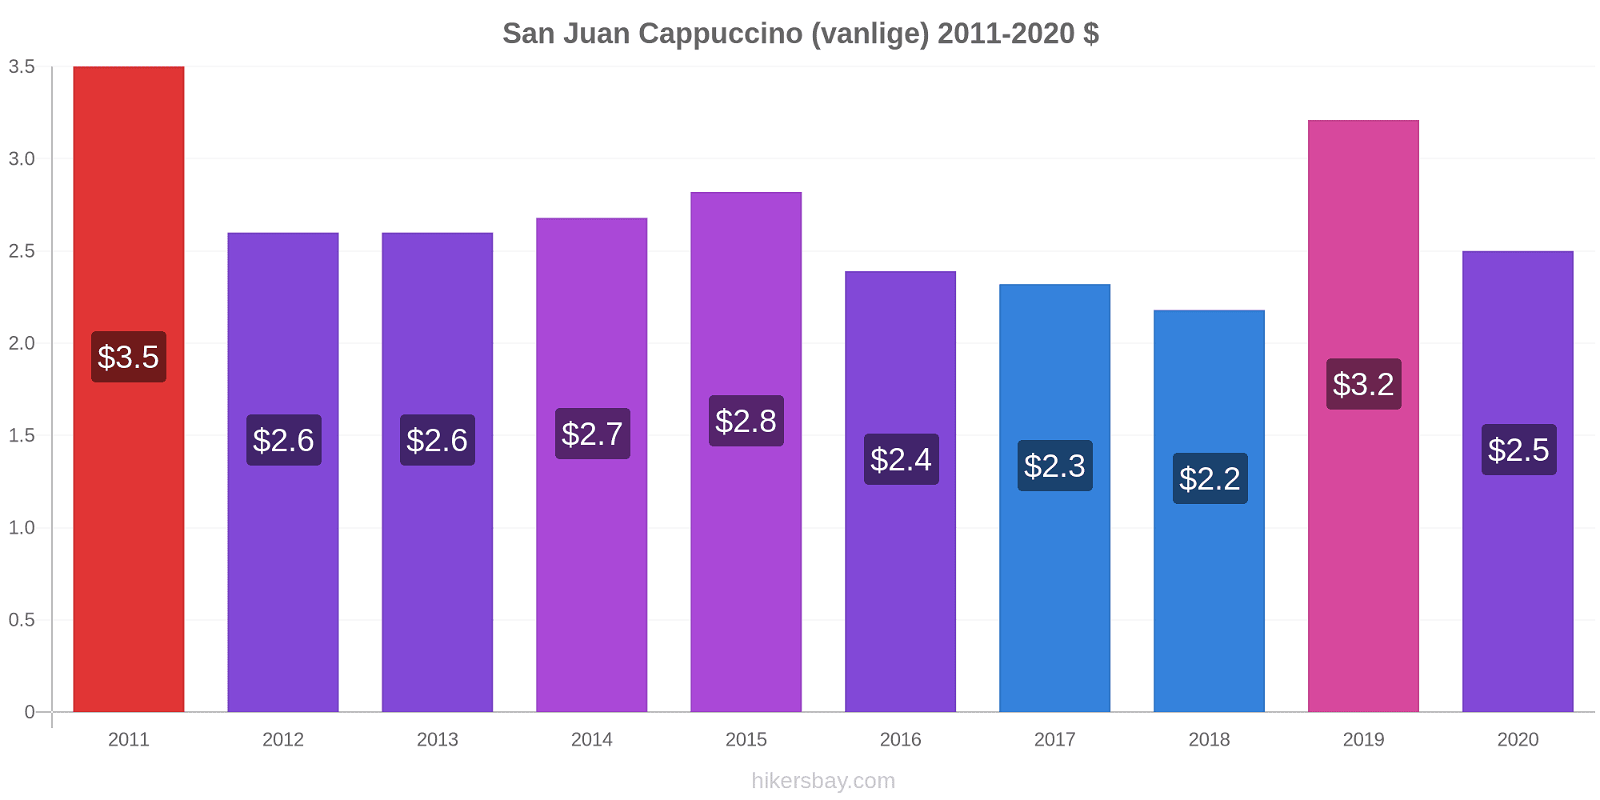 San Juan prisendringer Cappuccino (vanlige) hikersbay.com